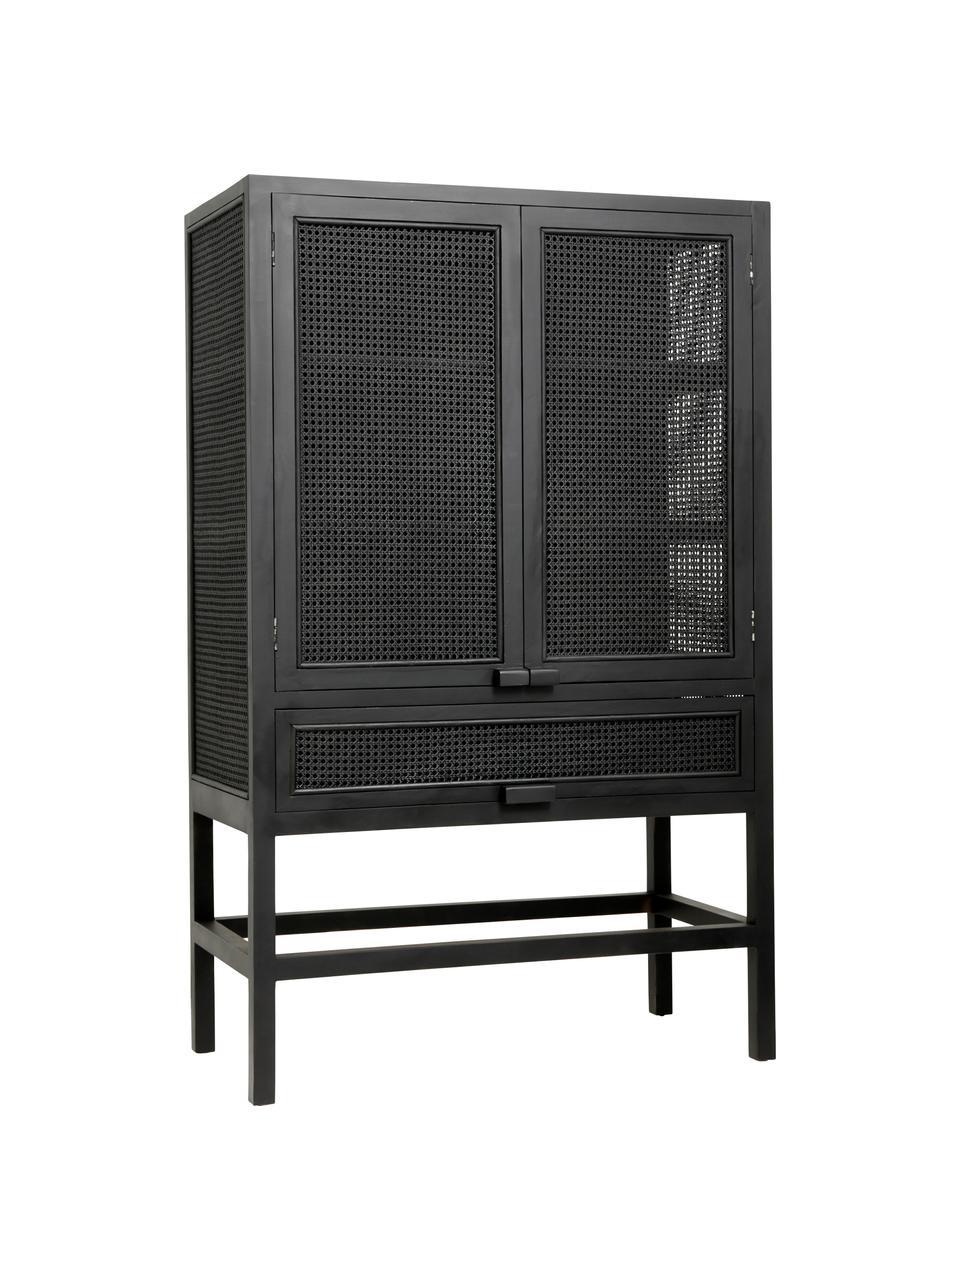 Dressoir Merge met Weens vlechtwerk in zwart, Frame: teakhout, gelakt, Zwart, 100 x 160 cm